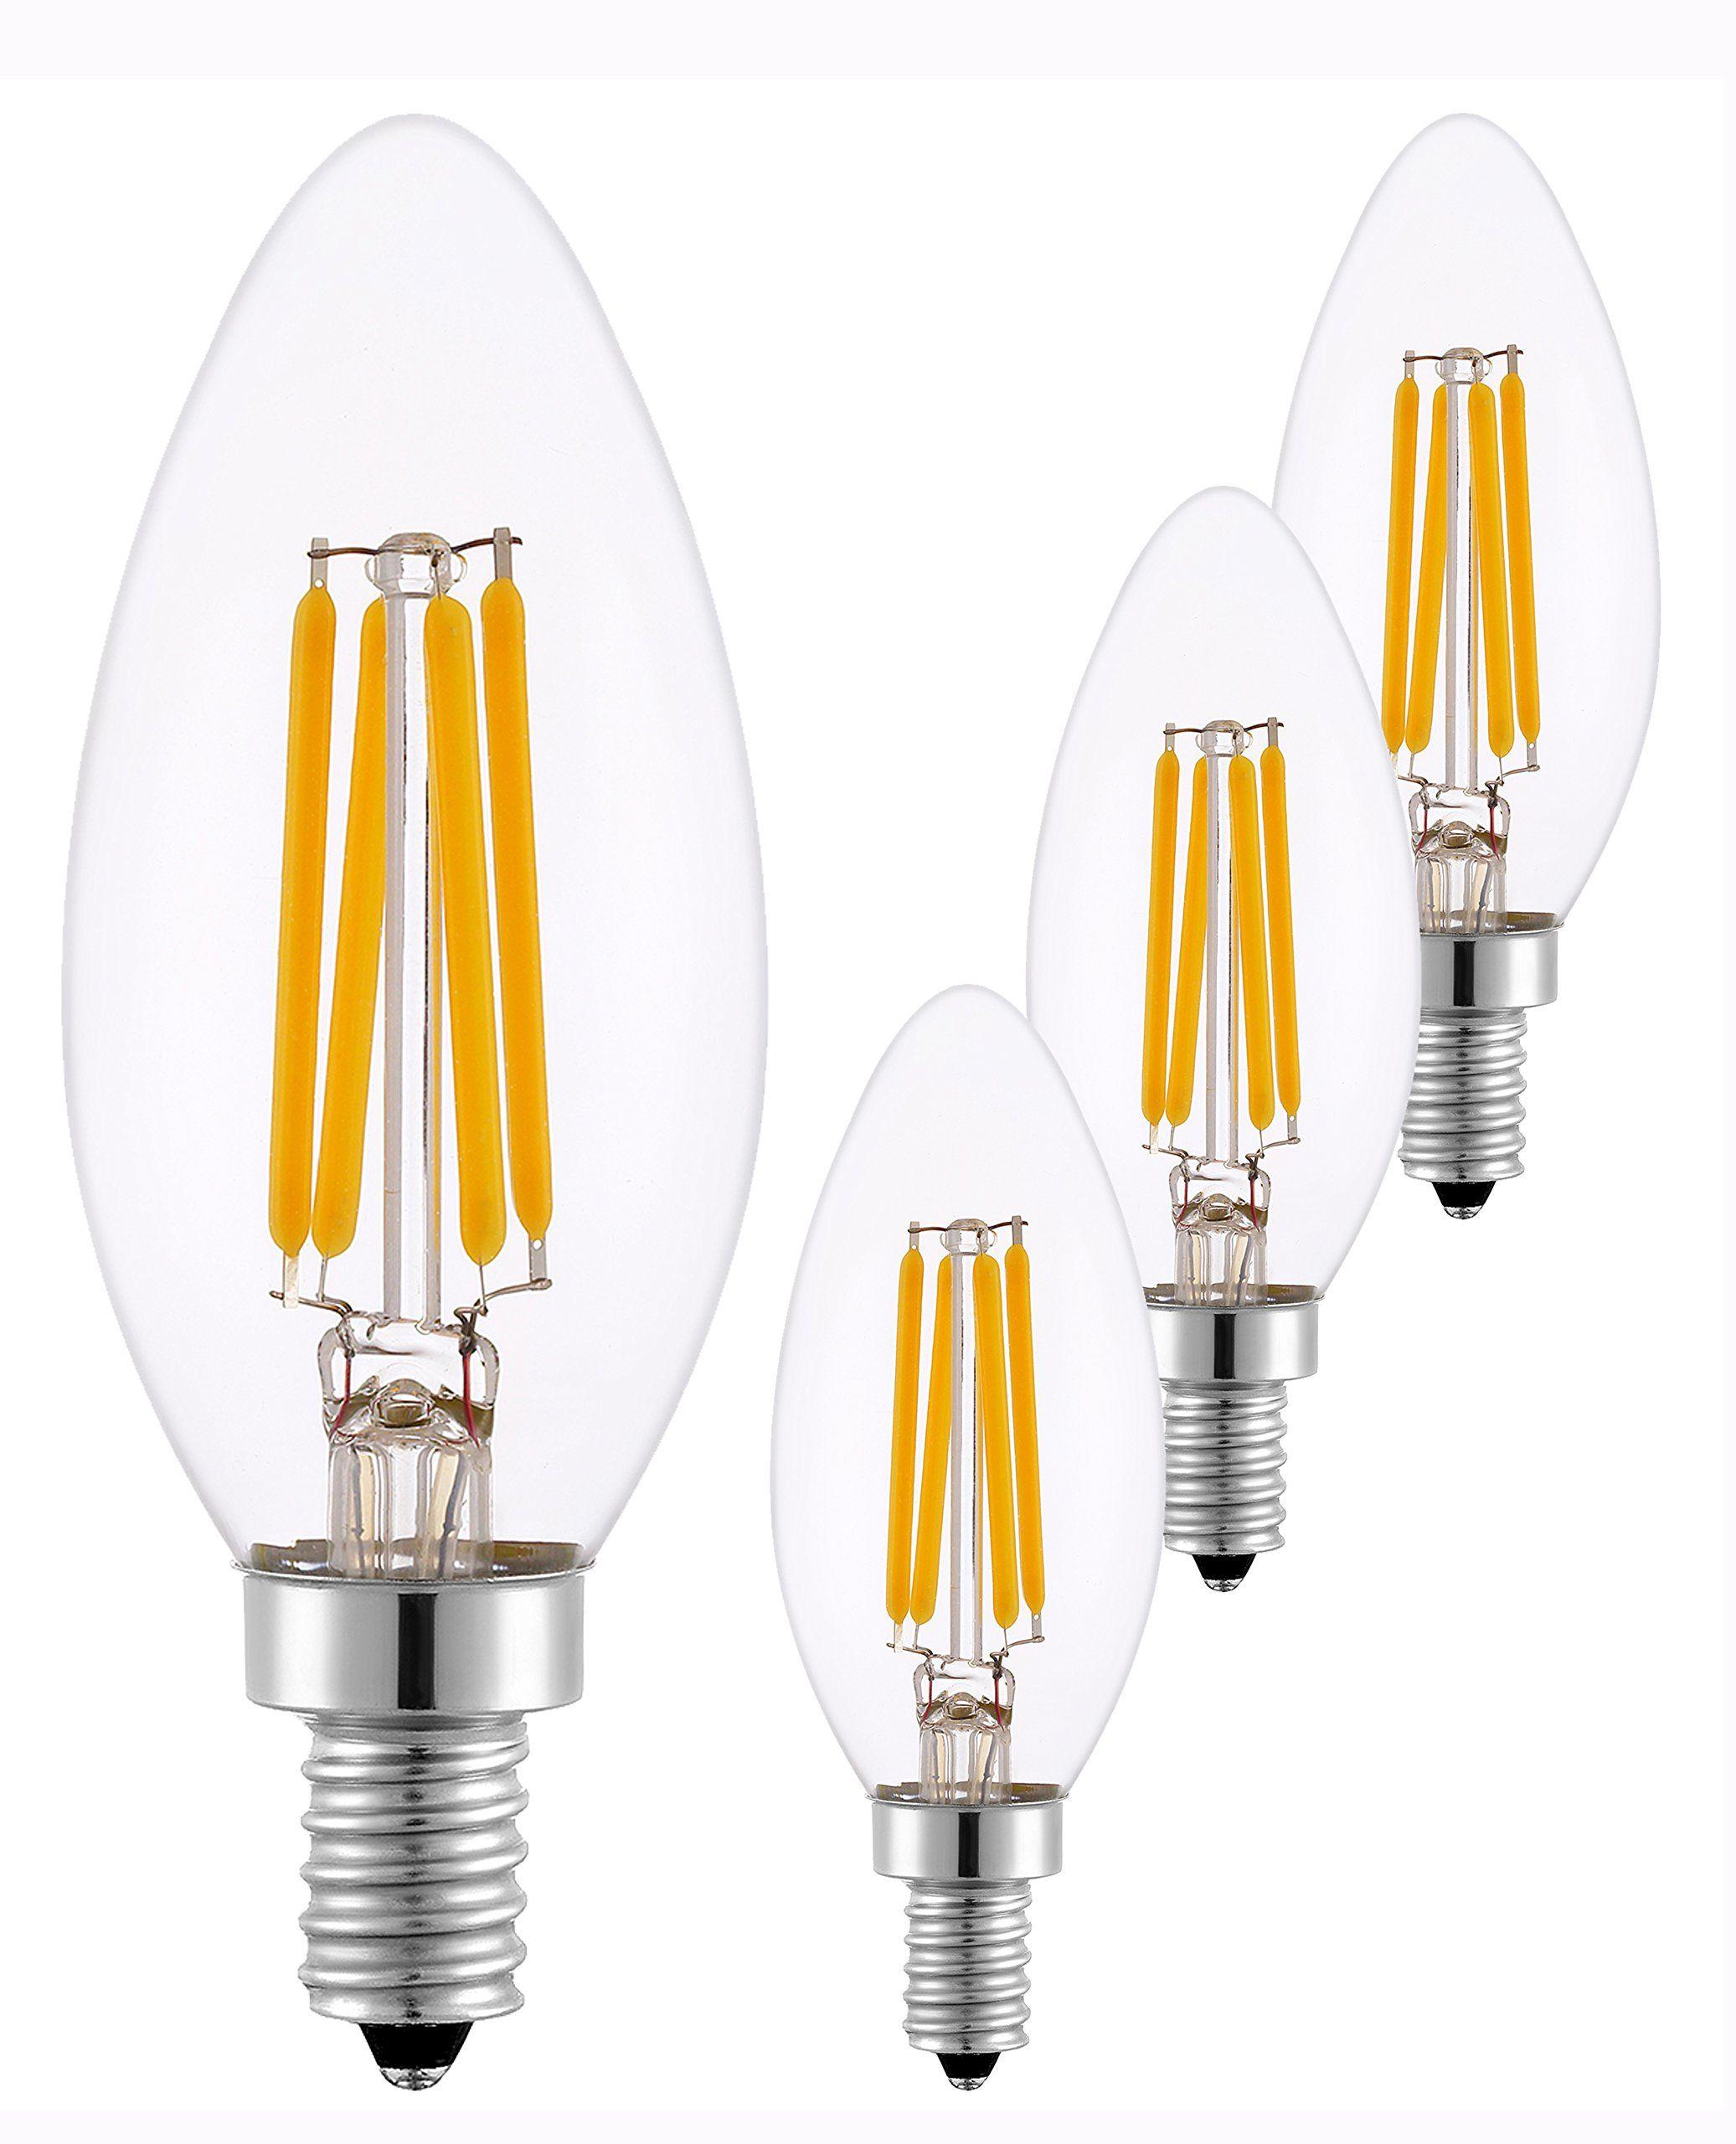 Sleeklighting 3 5 Watt E12 Led Filament Candelabra Light Bulb Dimmable 35w Incandescent Replacement Warm White 2700k Chandelie Candelabra Light Light Bulb Bulb